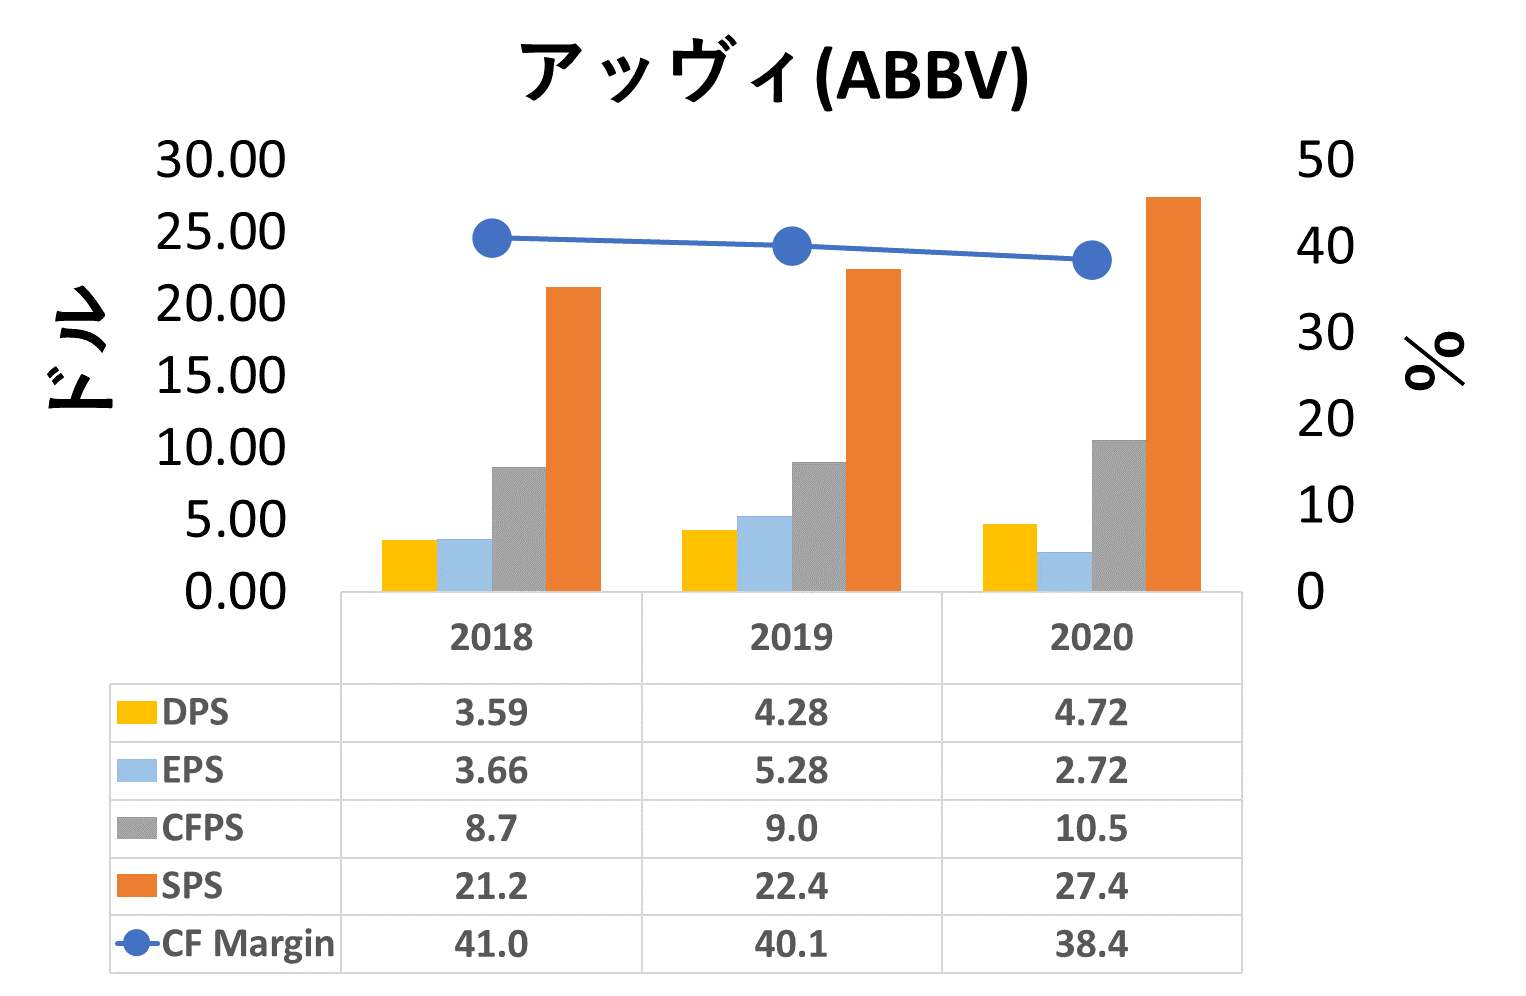 ABBV‐一株分析